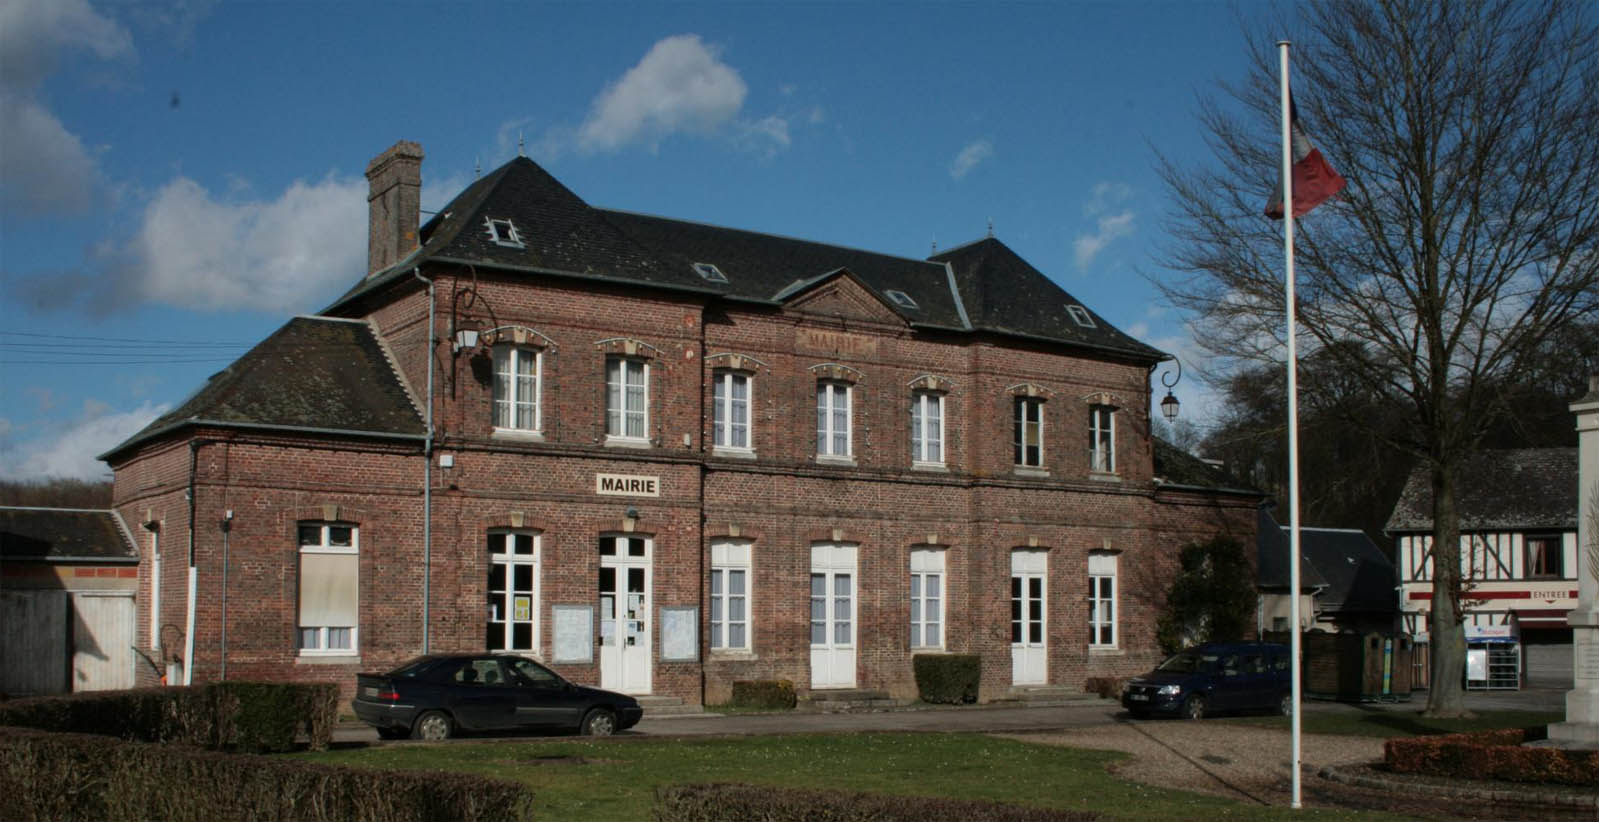 Blainville-Crevon (France)